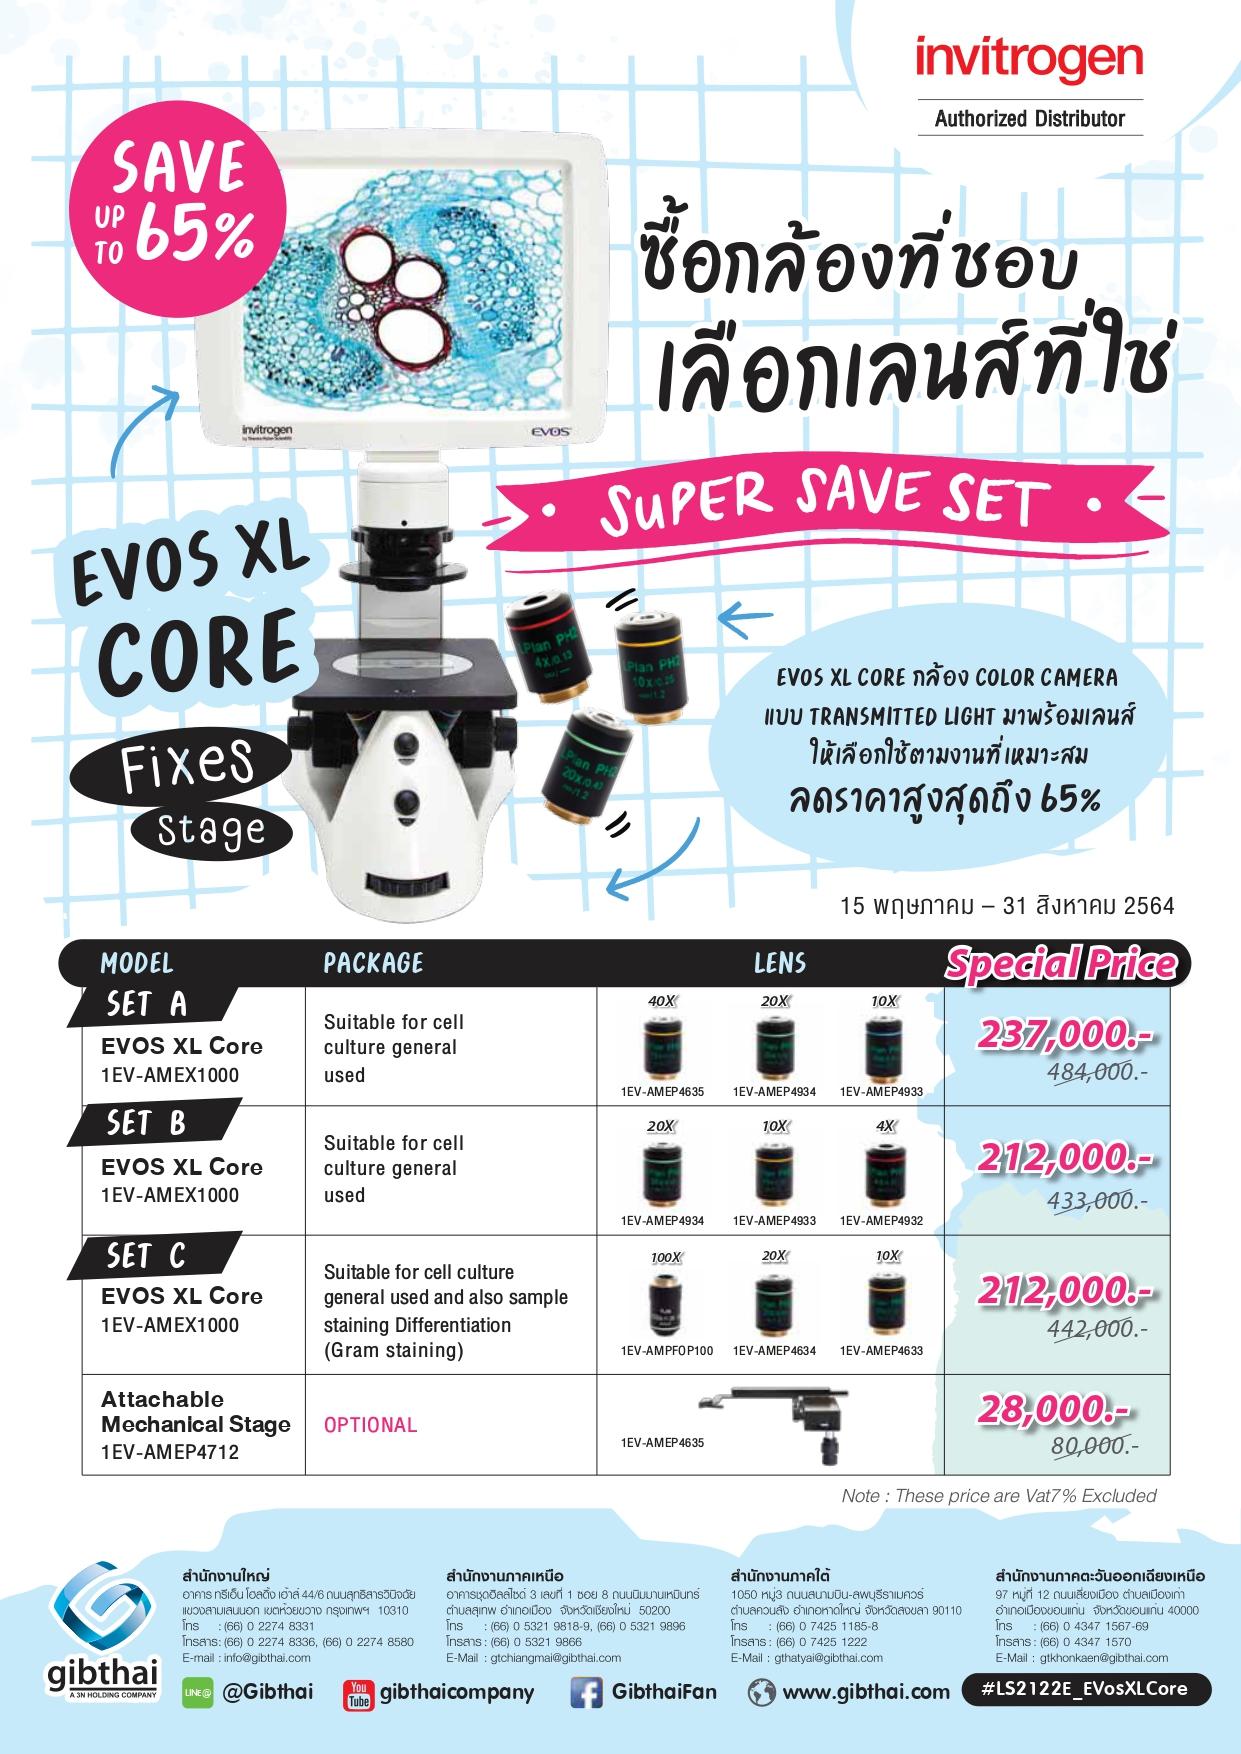 Evos XL Core